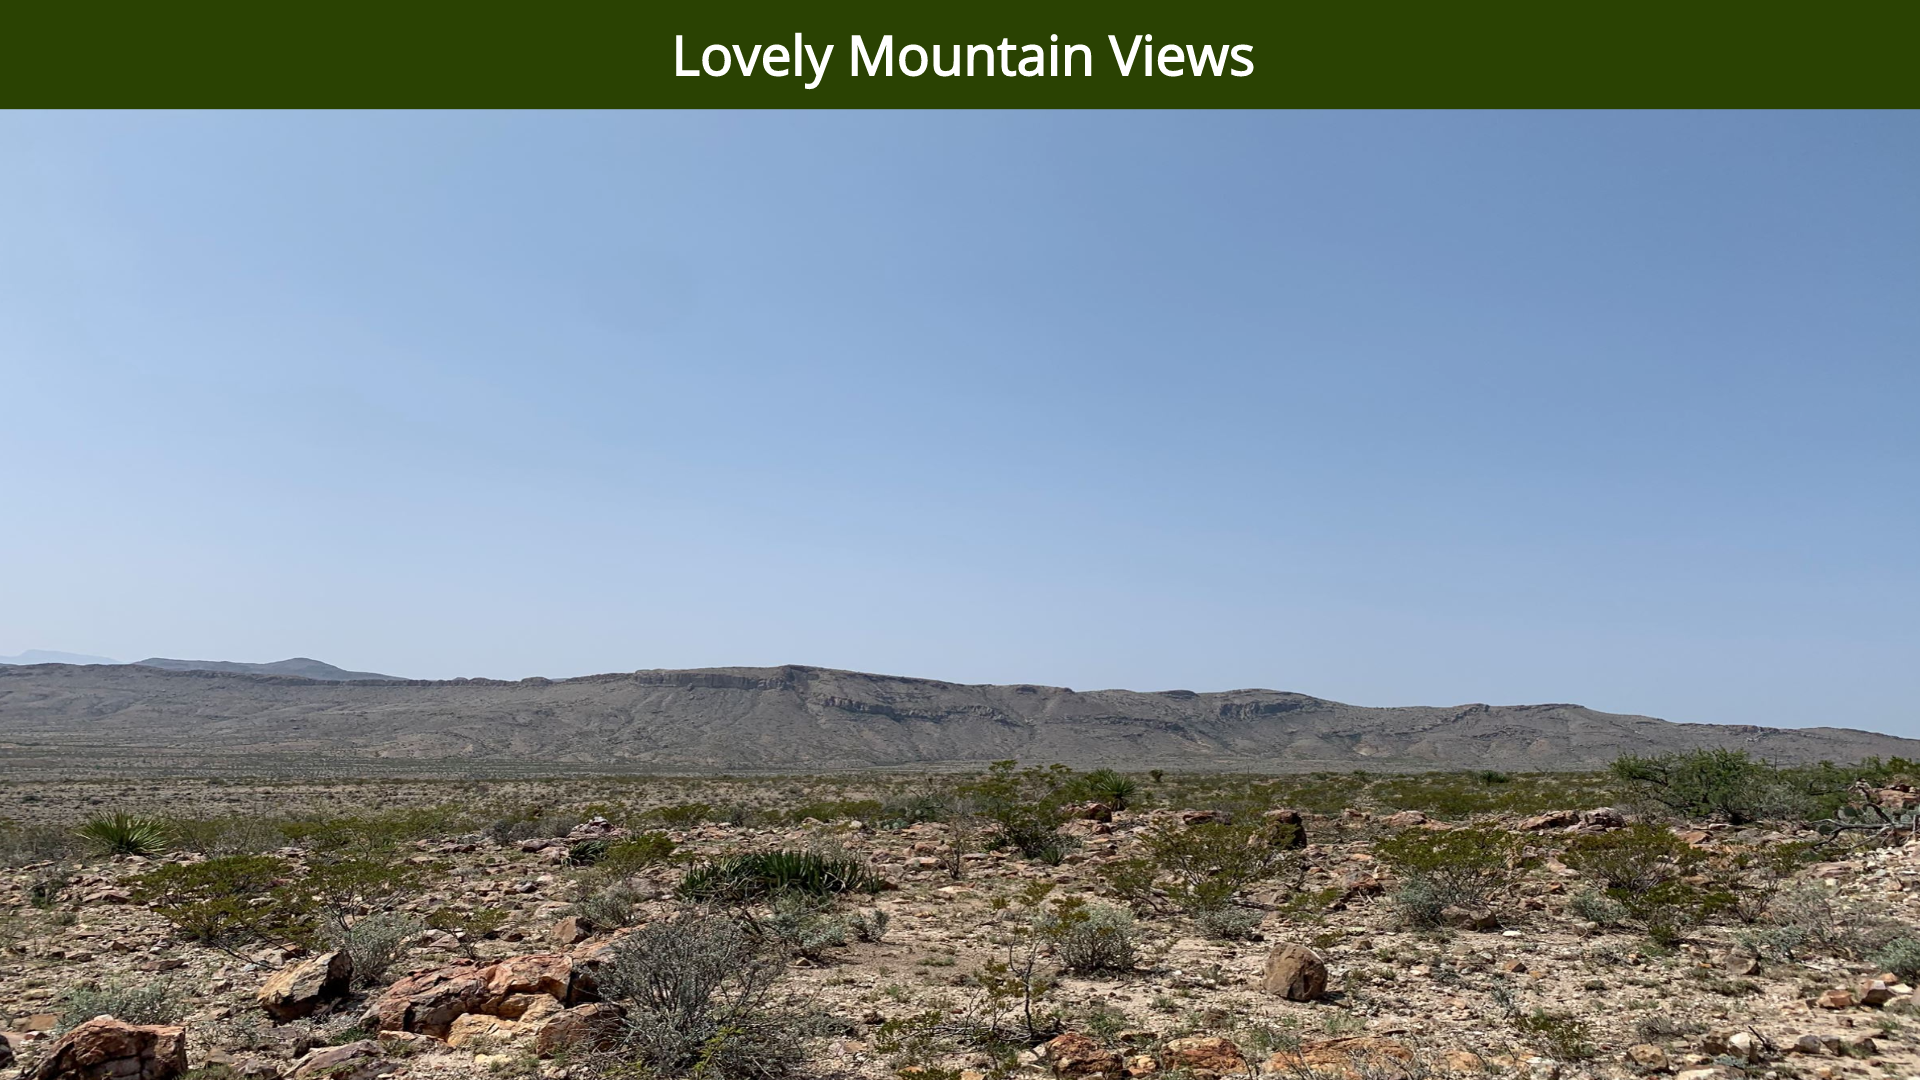 Lovely Mountain Views